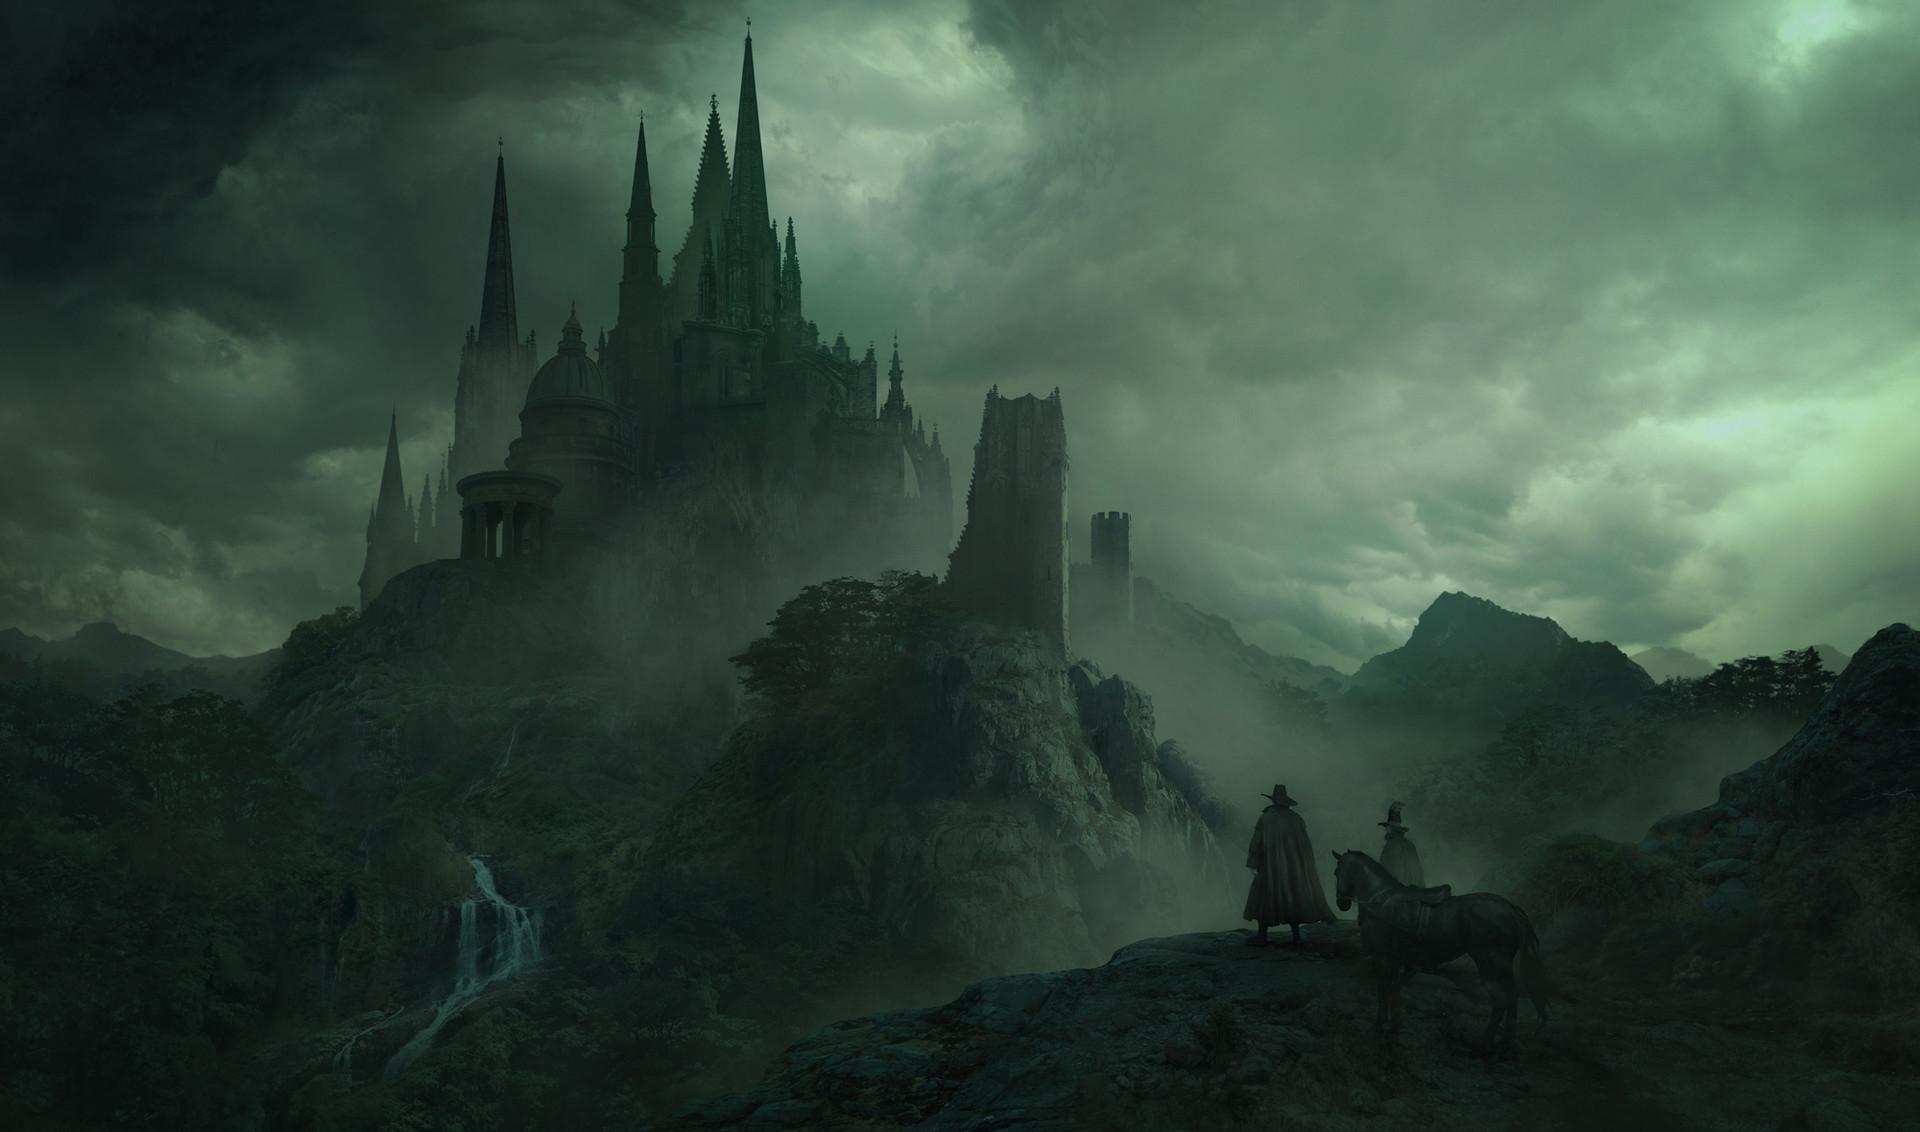 Guillem h pongiluppi castle of the devil act1 1